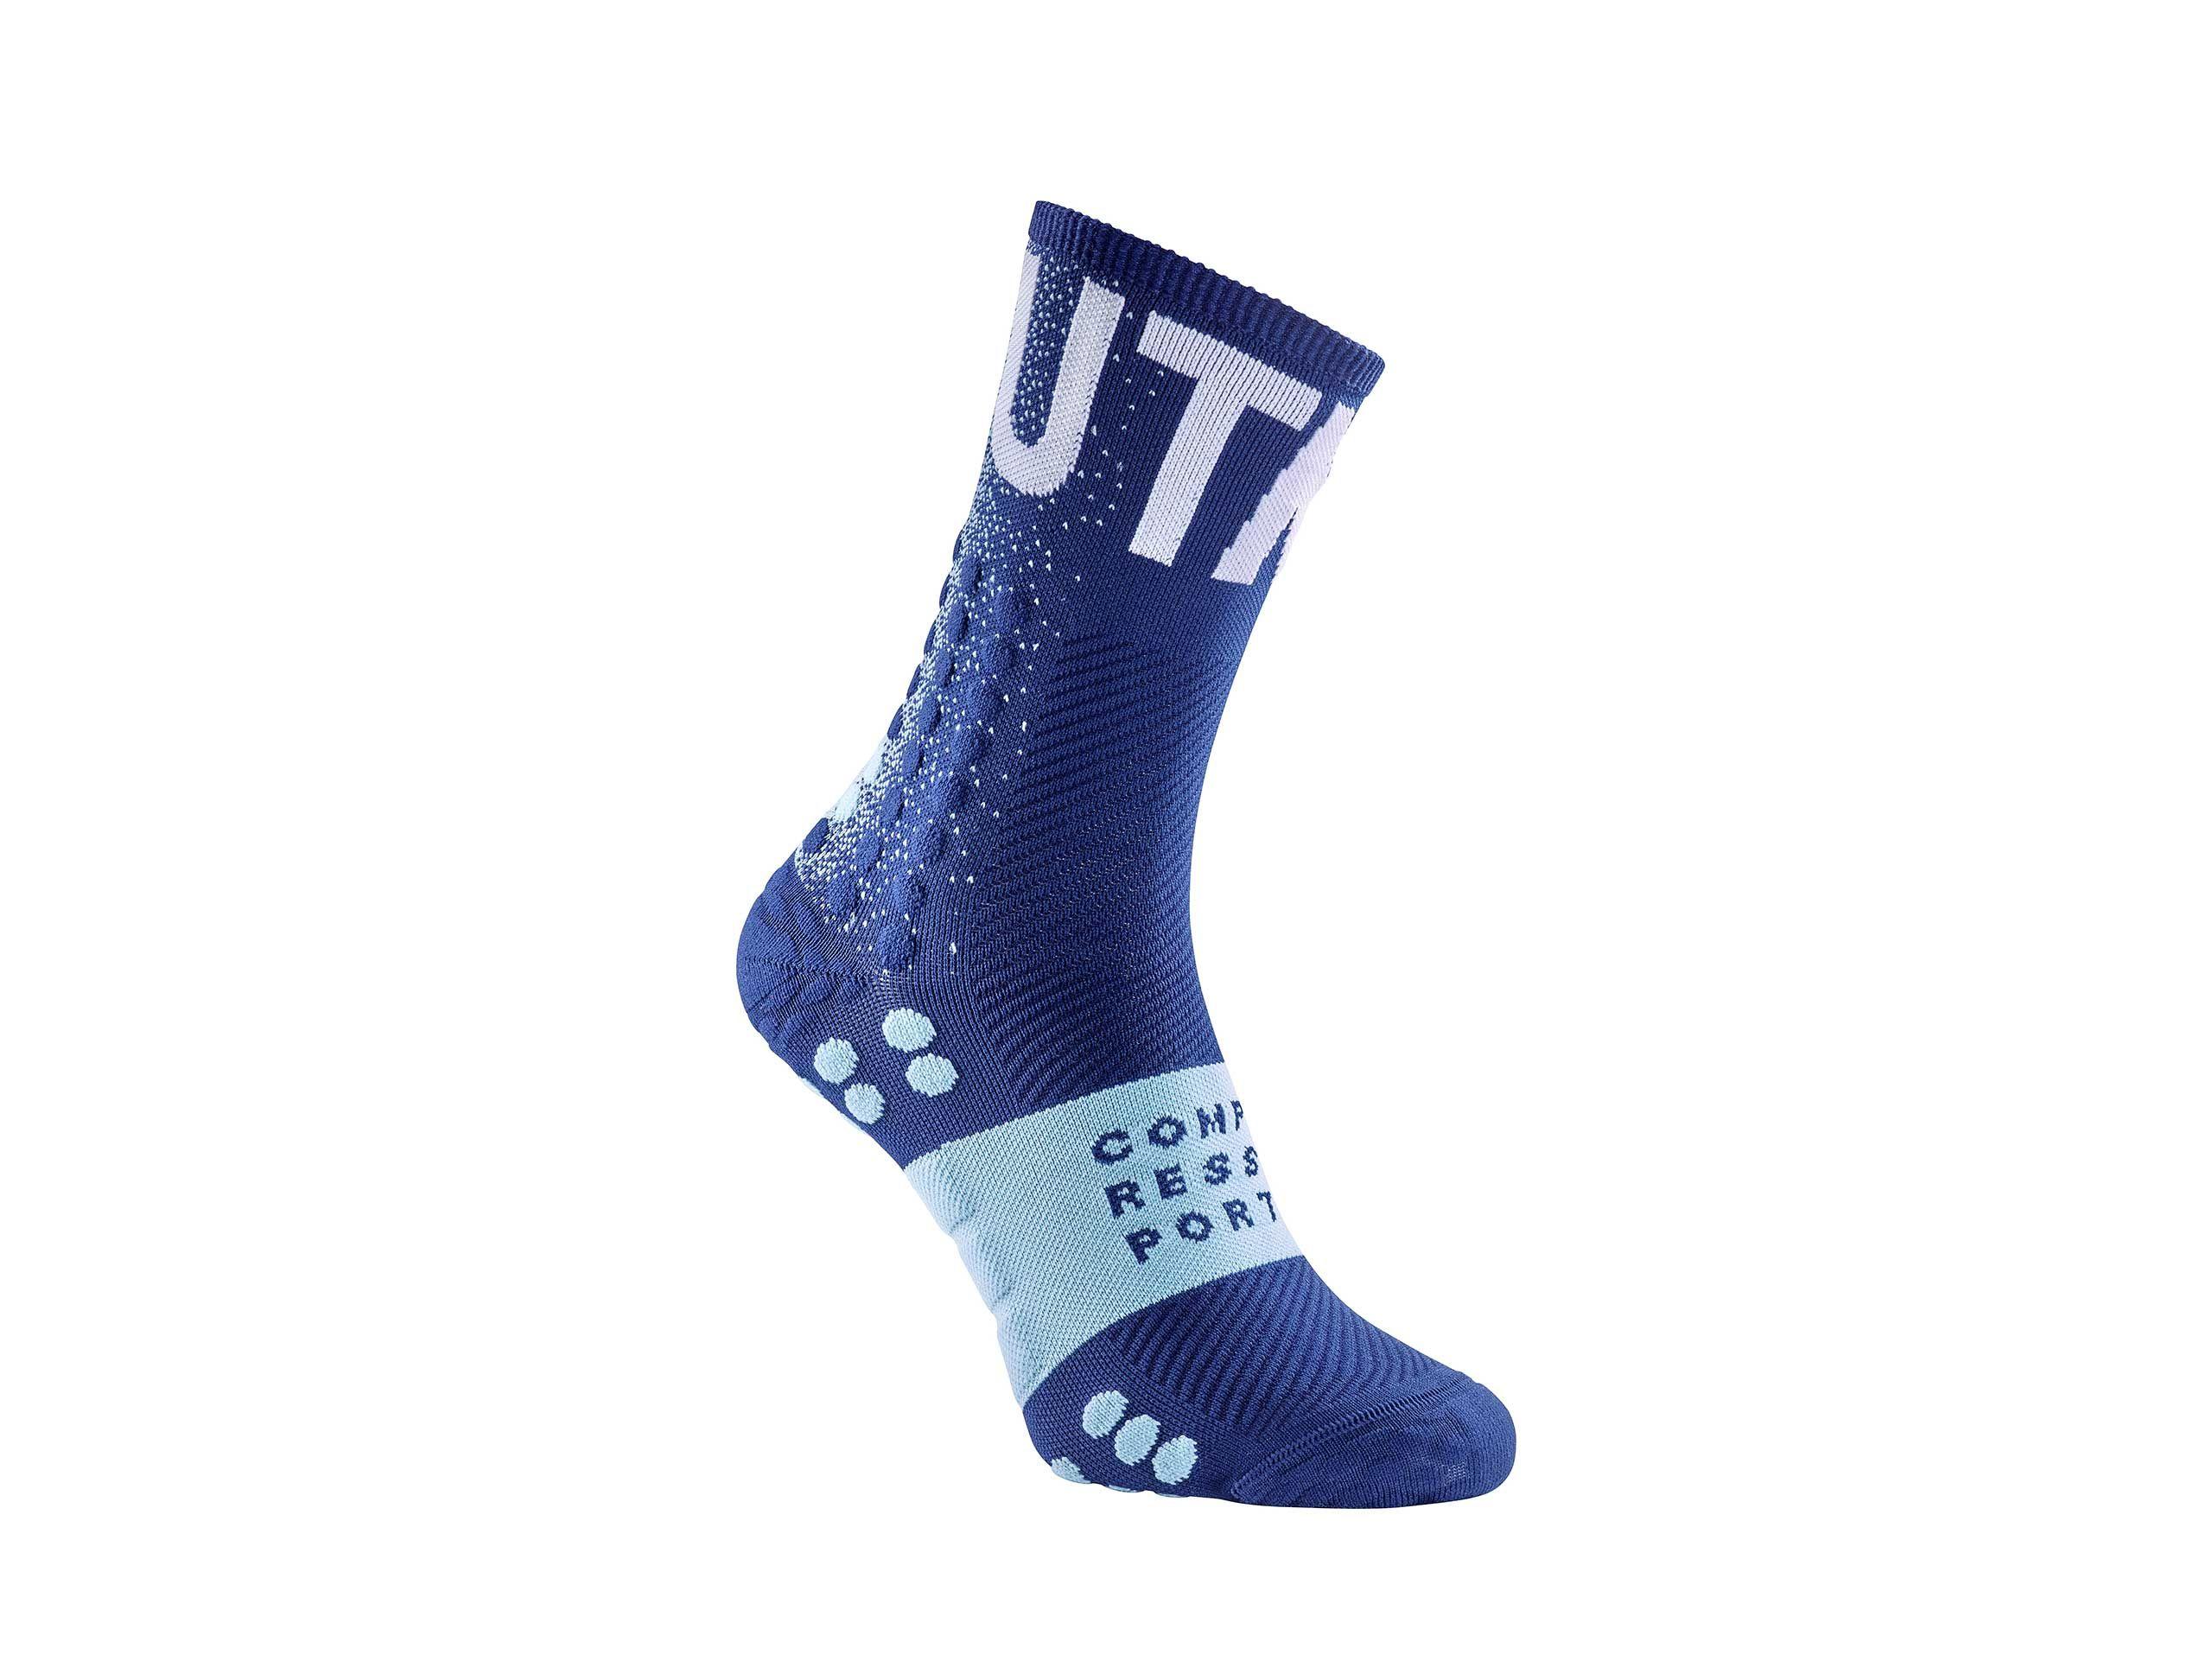 Pro Racing Socks v3.0 Ultra Trail - UTMB 2020